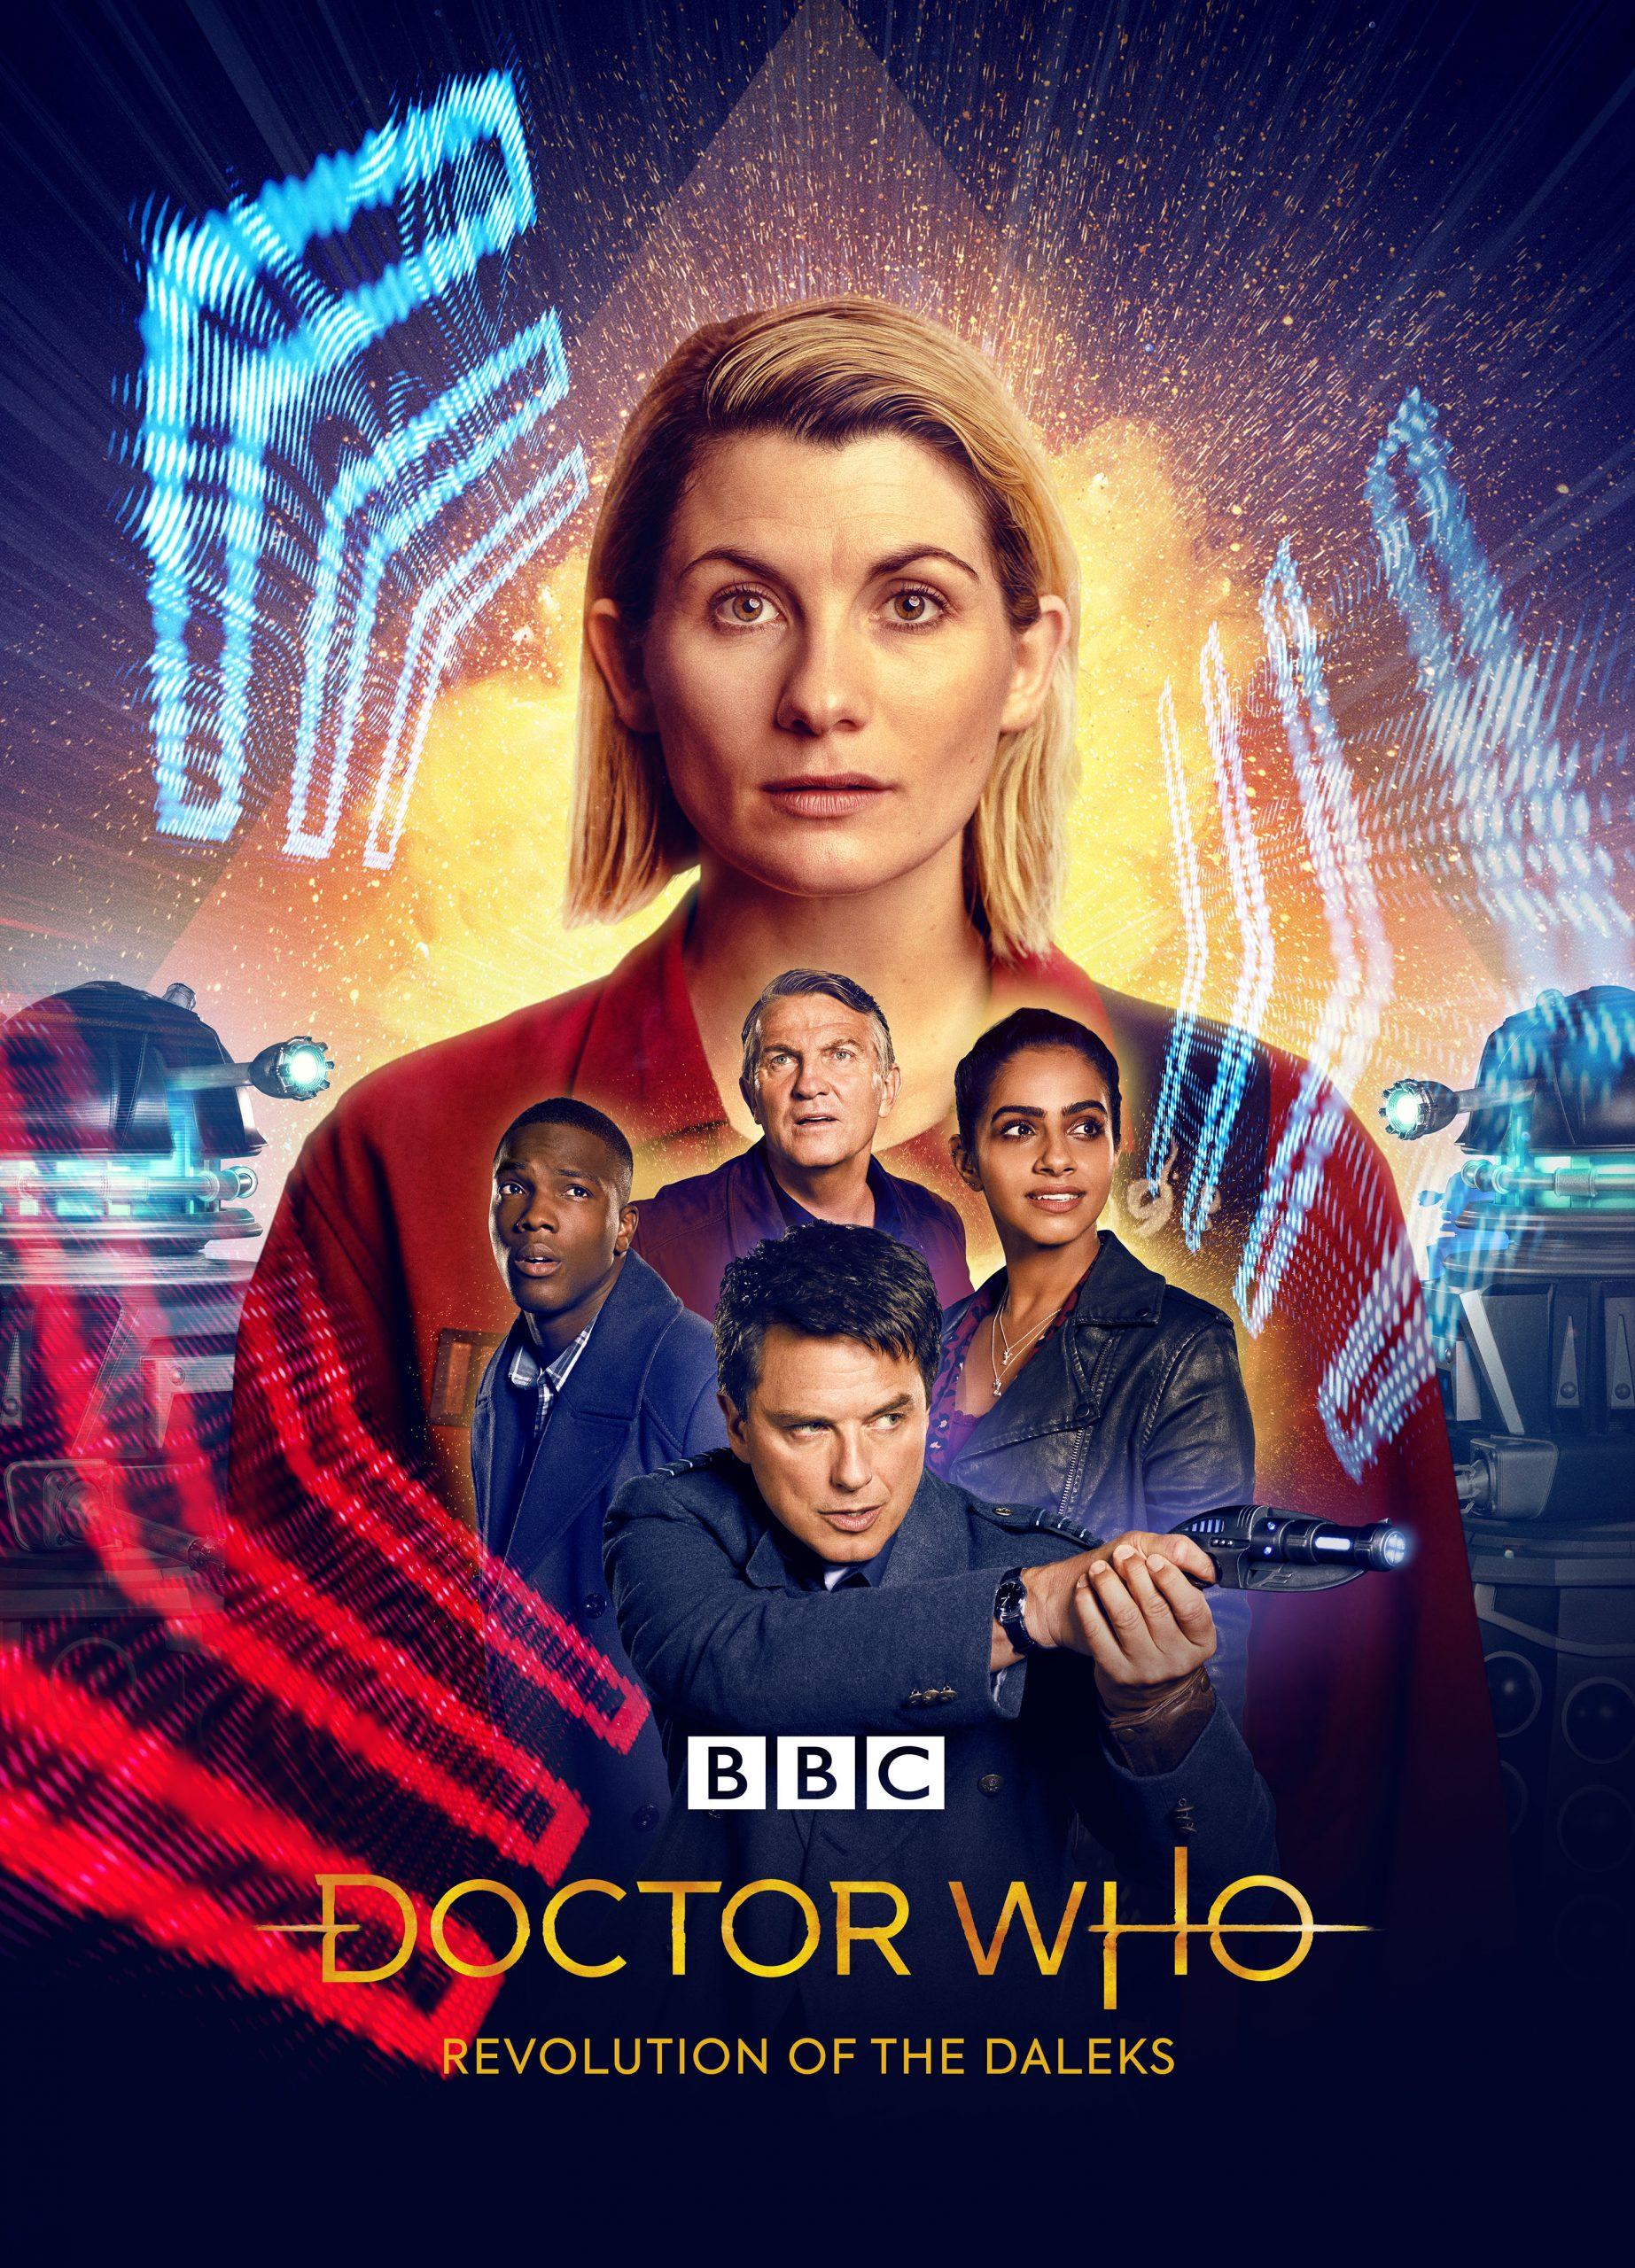 Picture Shows: The Doctor (JODIE WHITTAKER), Captain Jack Harkness (JOHN BARROWMAN), Graham O'Brien (BRADLEY WALSH), Yasmin Khan (MANDIP GILL), Ryan Sinclair (TOSIN COLE), Daleks. Revolution of the Daleks Doctor Who